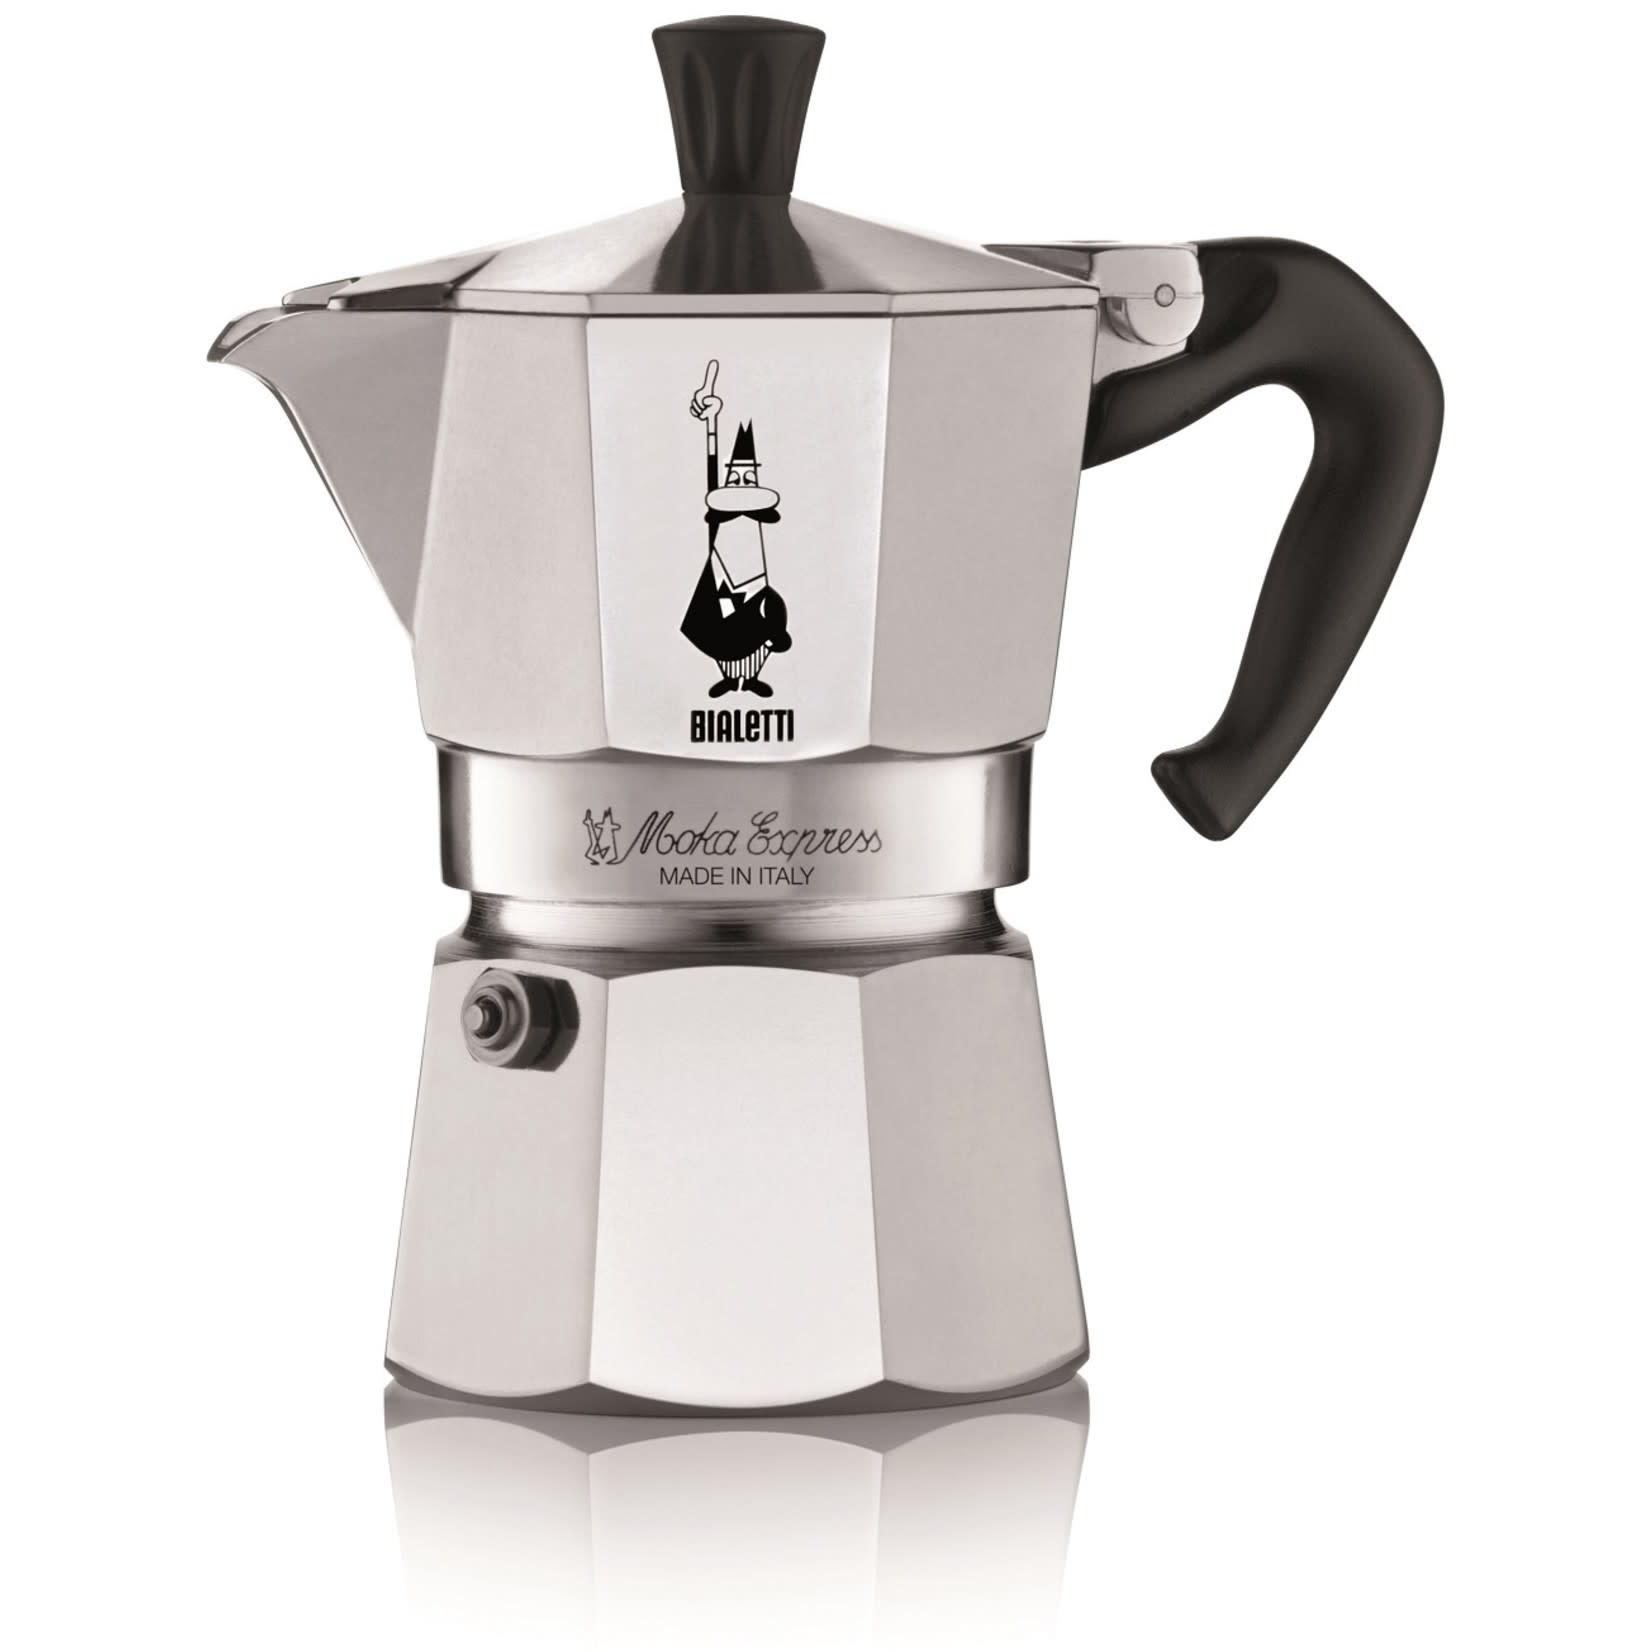 Bialetti Moka Express 3-kops Espressopot